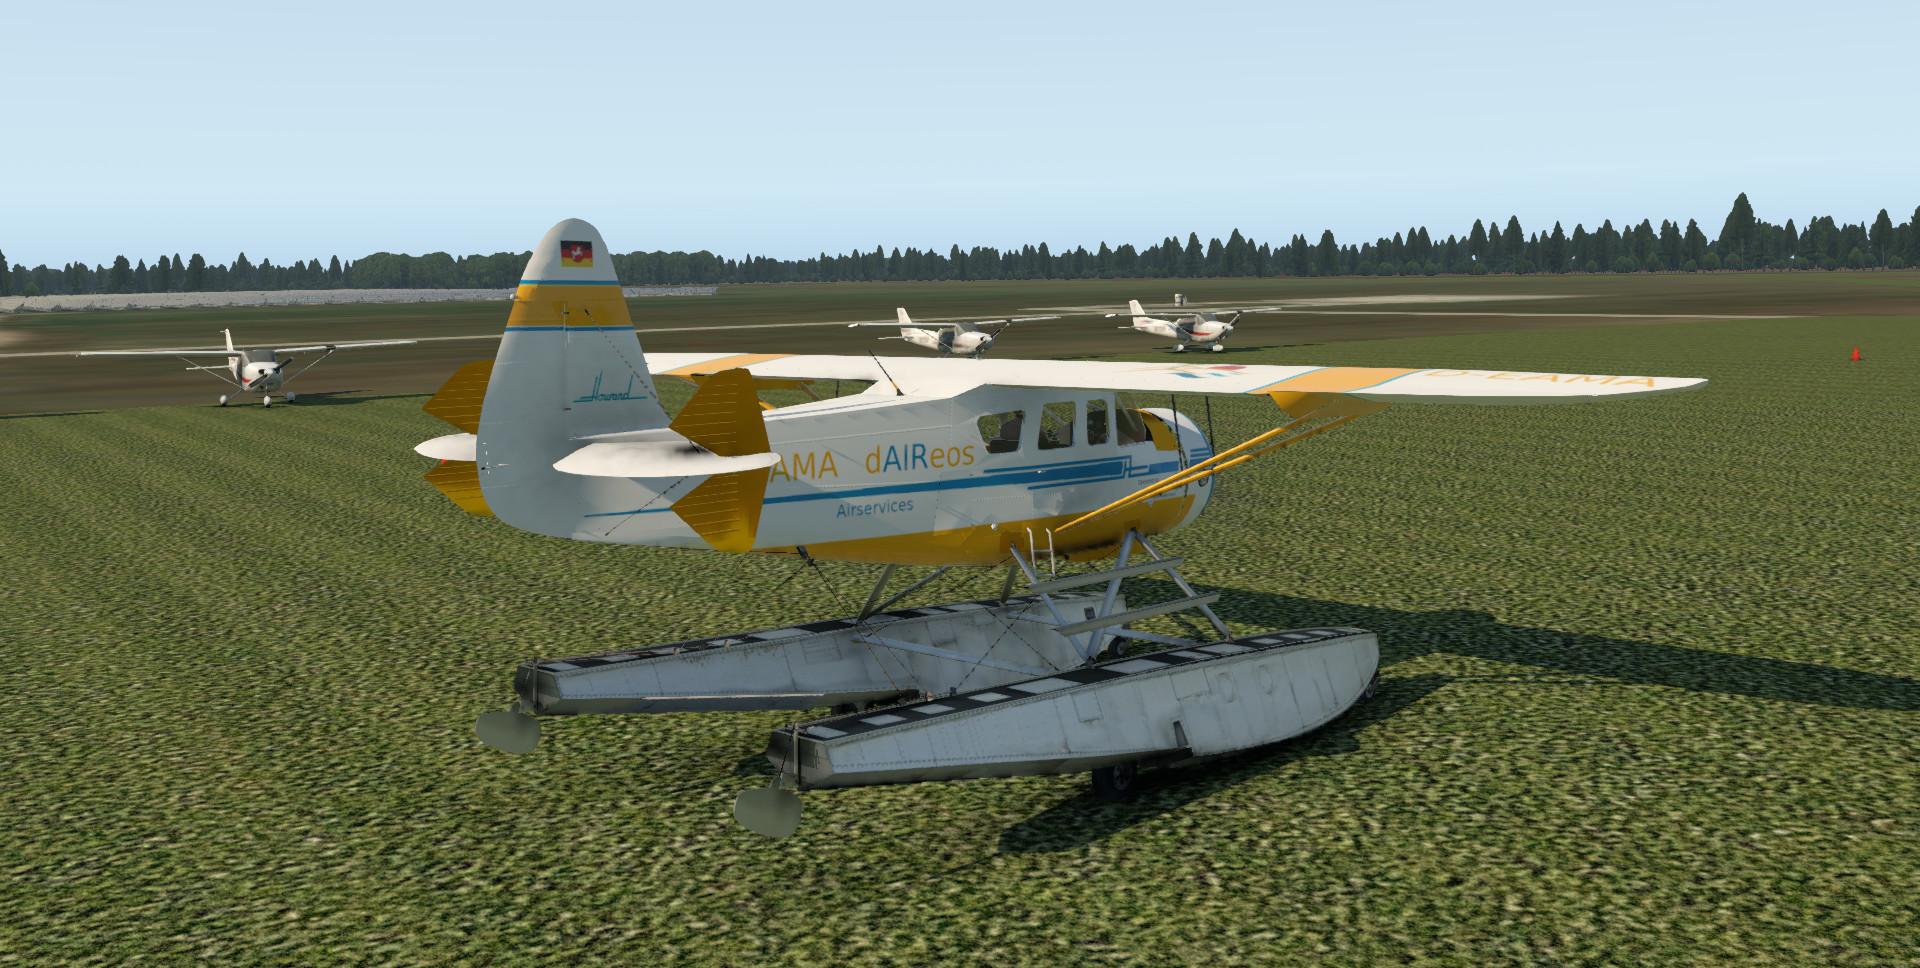 nordseerundflug-03150kre.jpg